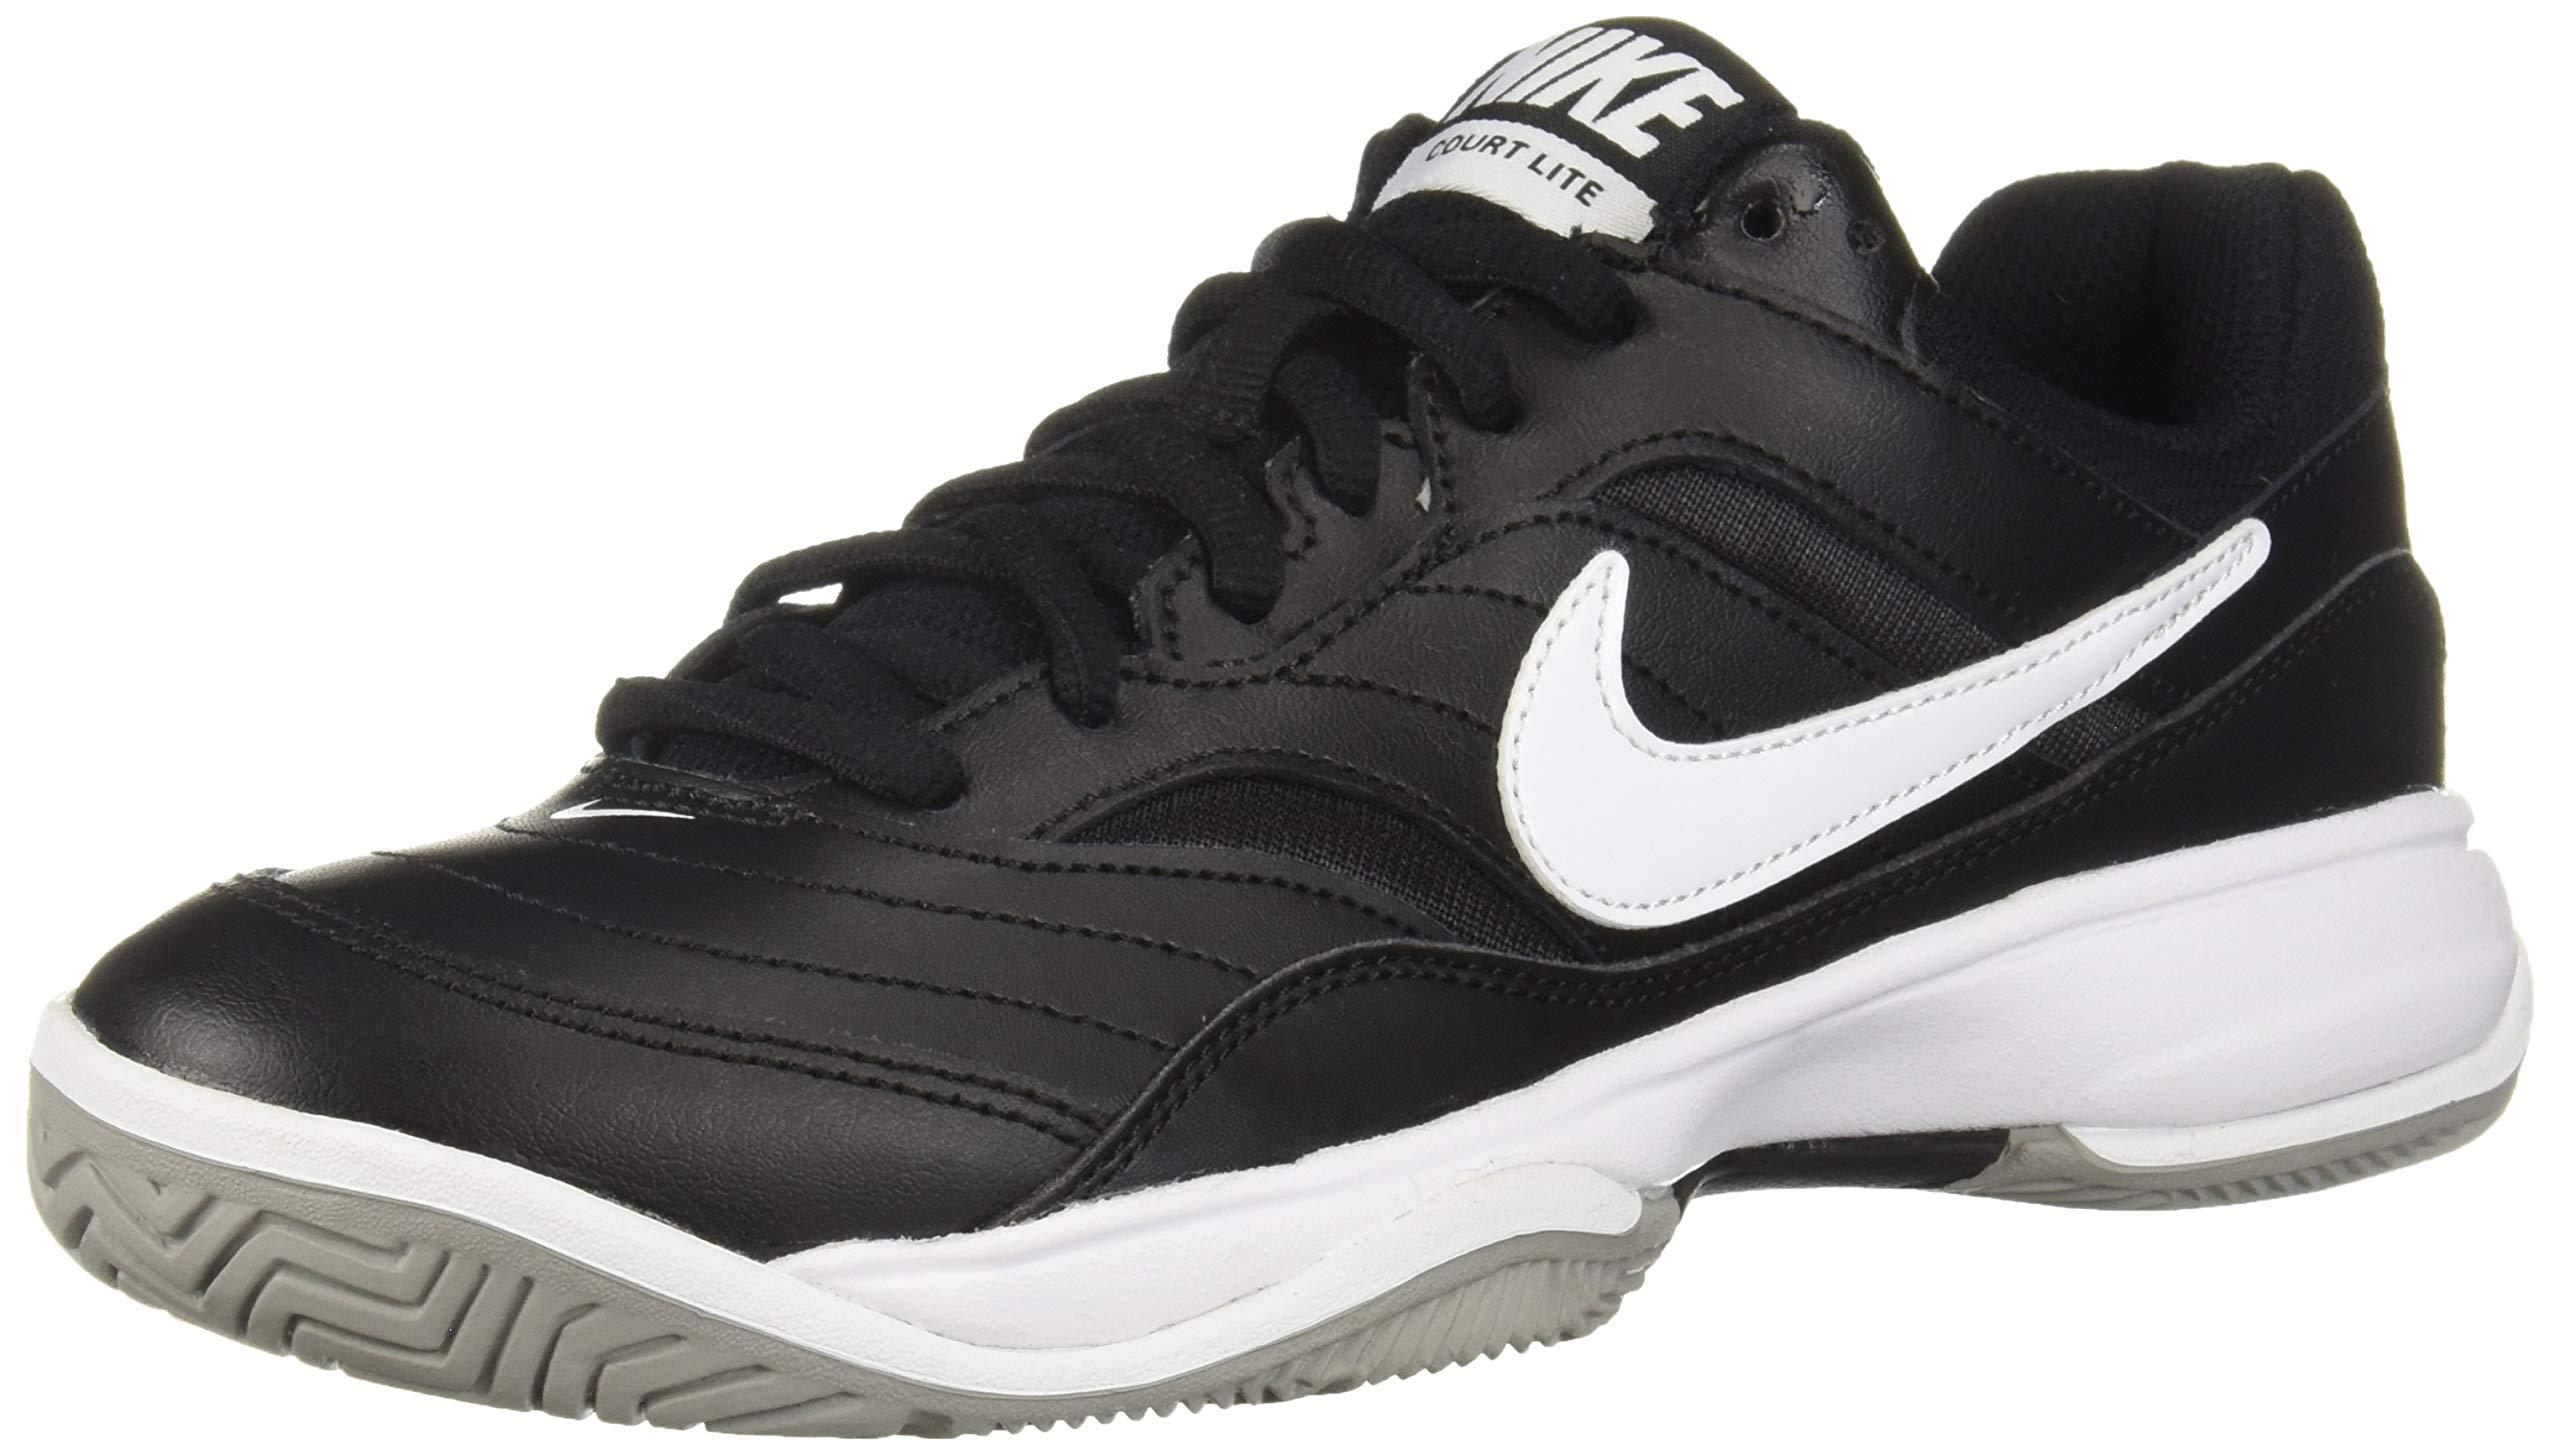 NIKE Men's Court Lite Athletic Shoe, Black/White/Medium Grey, 10 Regular US by Nike